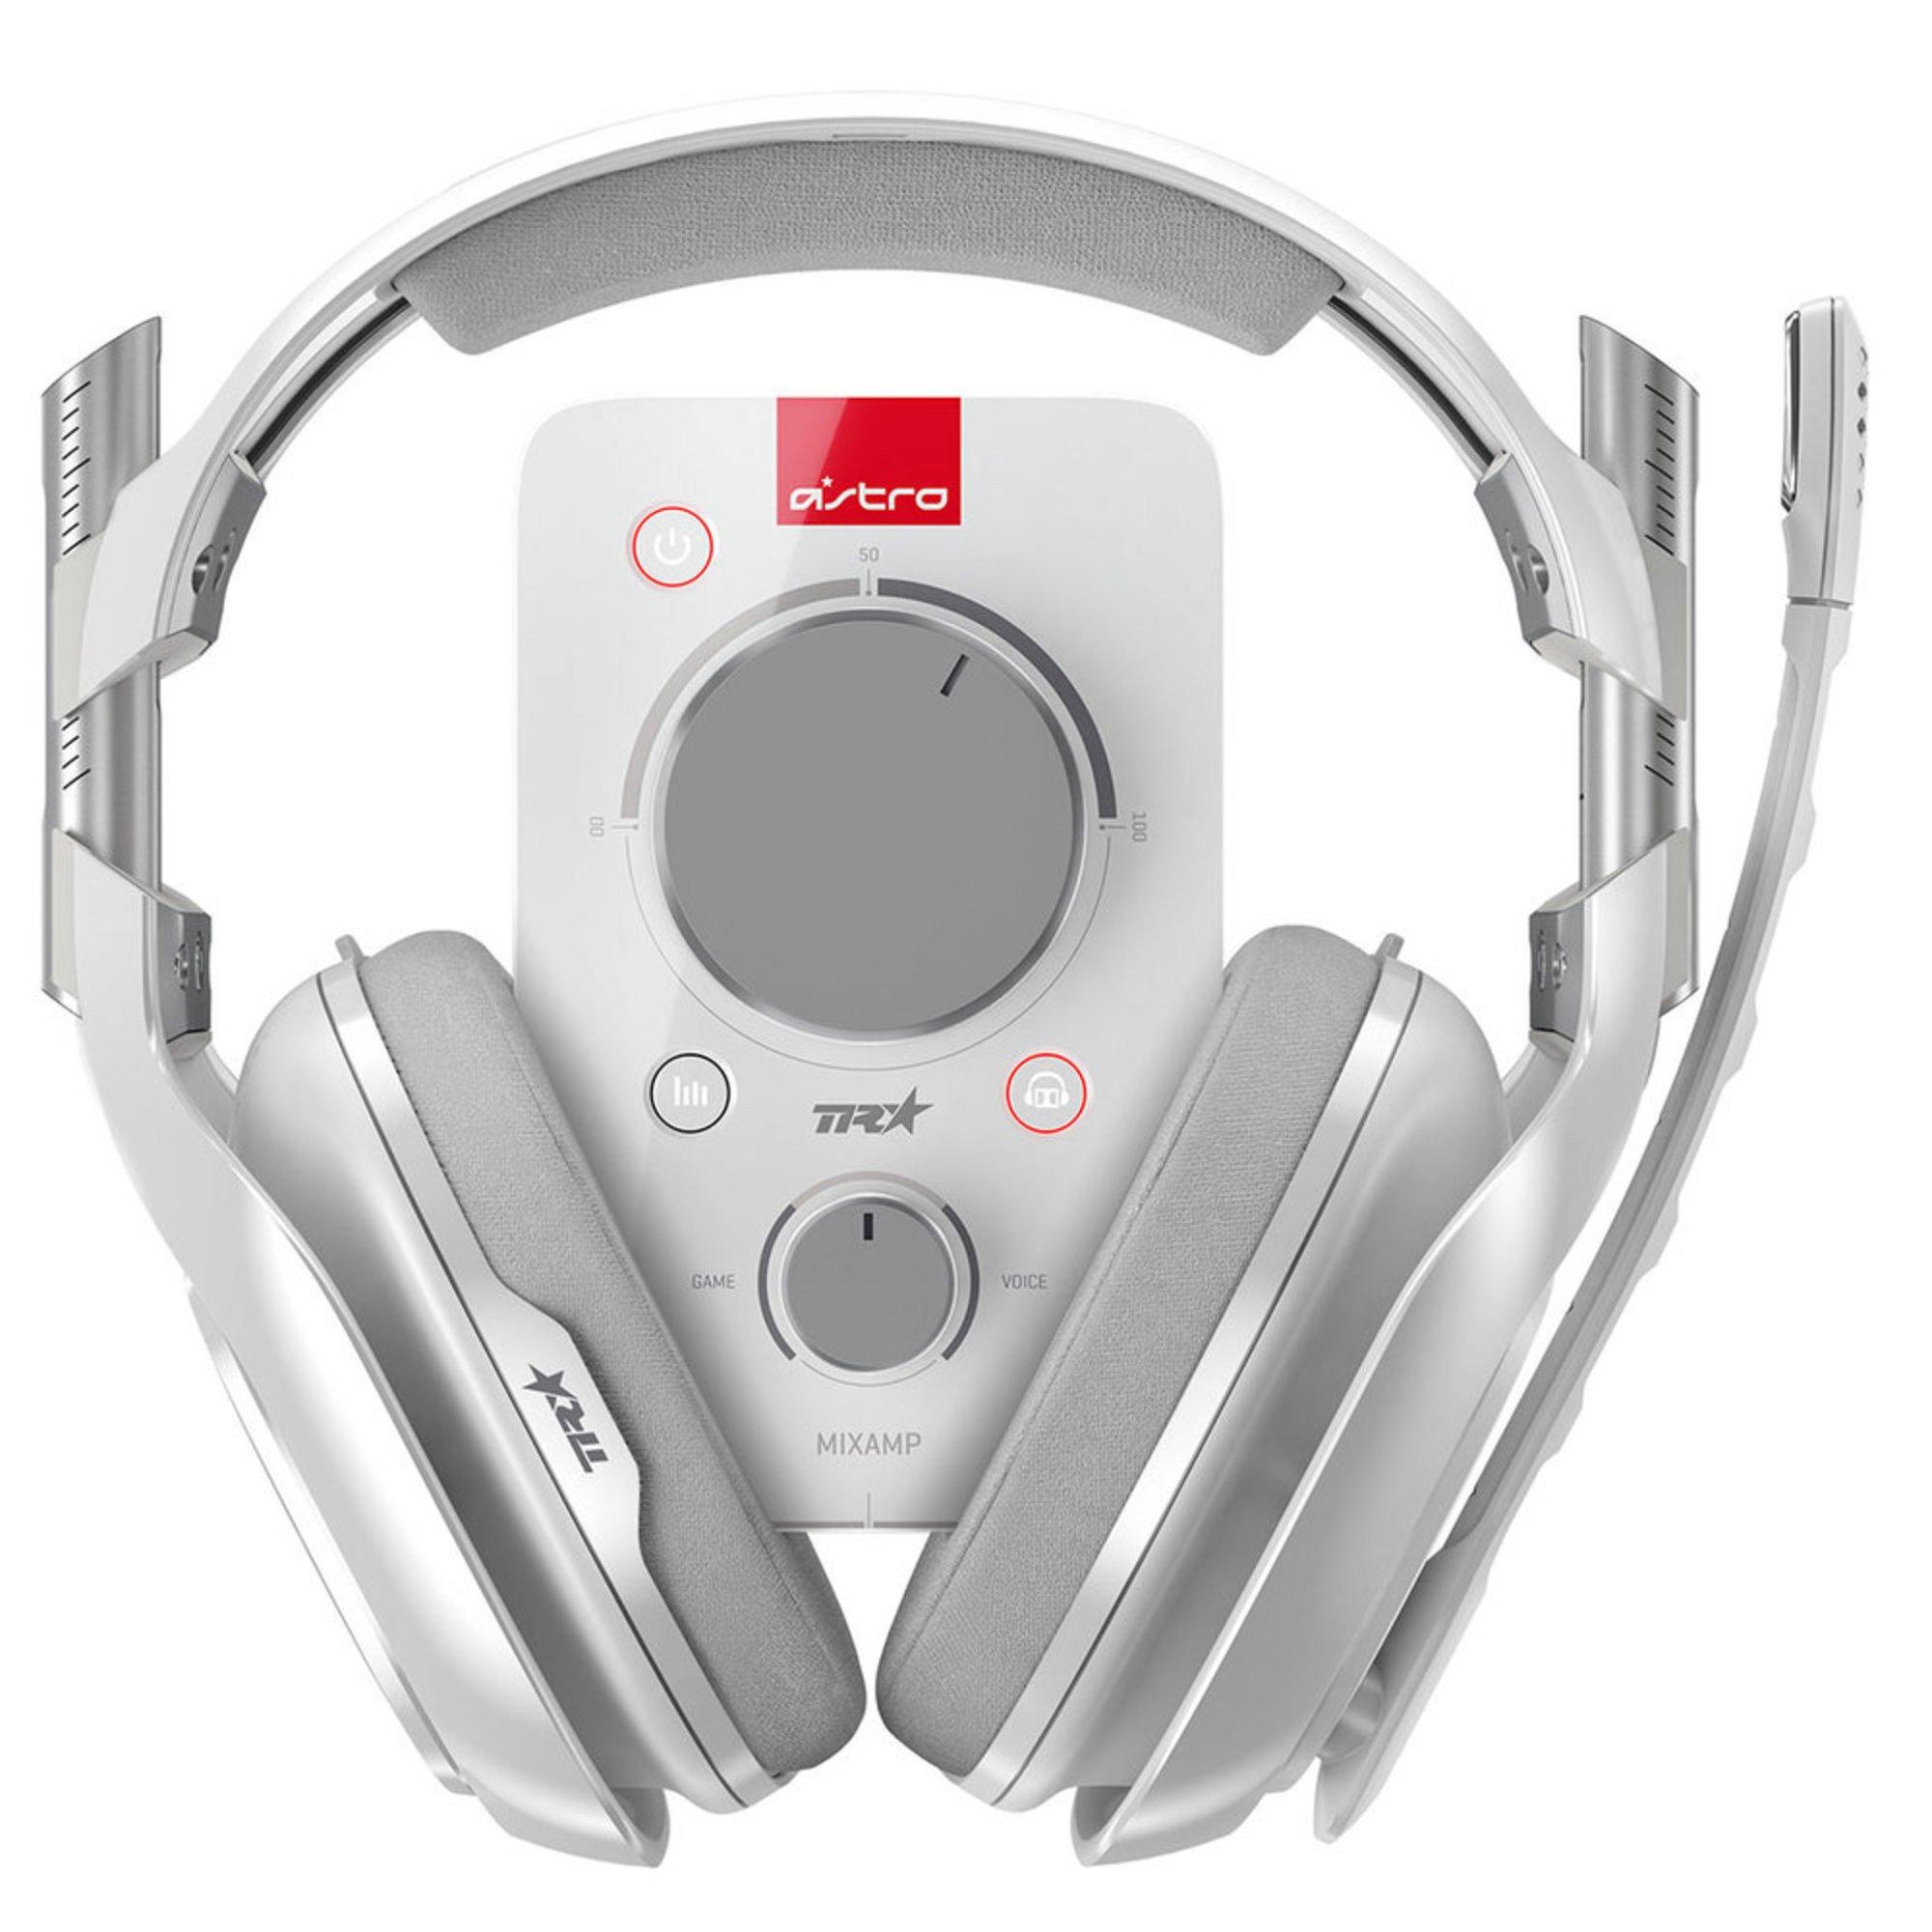 614ff633e57 Astro A40 Xbox One Tr + Mixamp Pro Tr:headset, White | Gaming ...